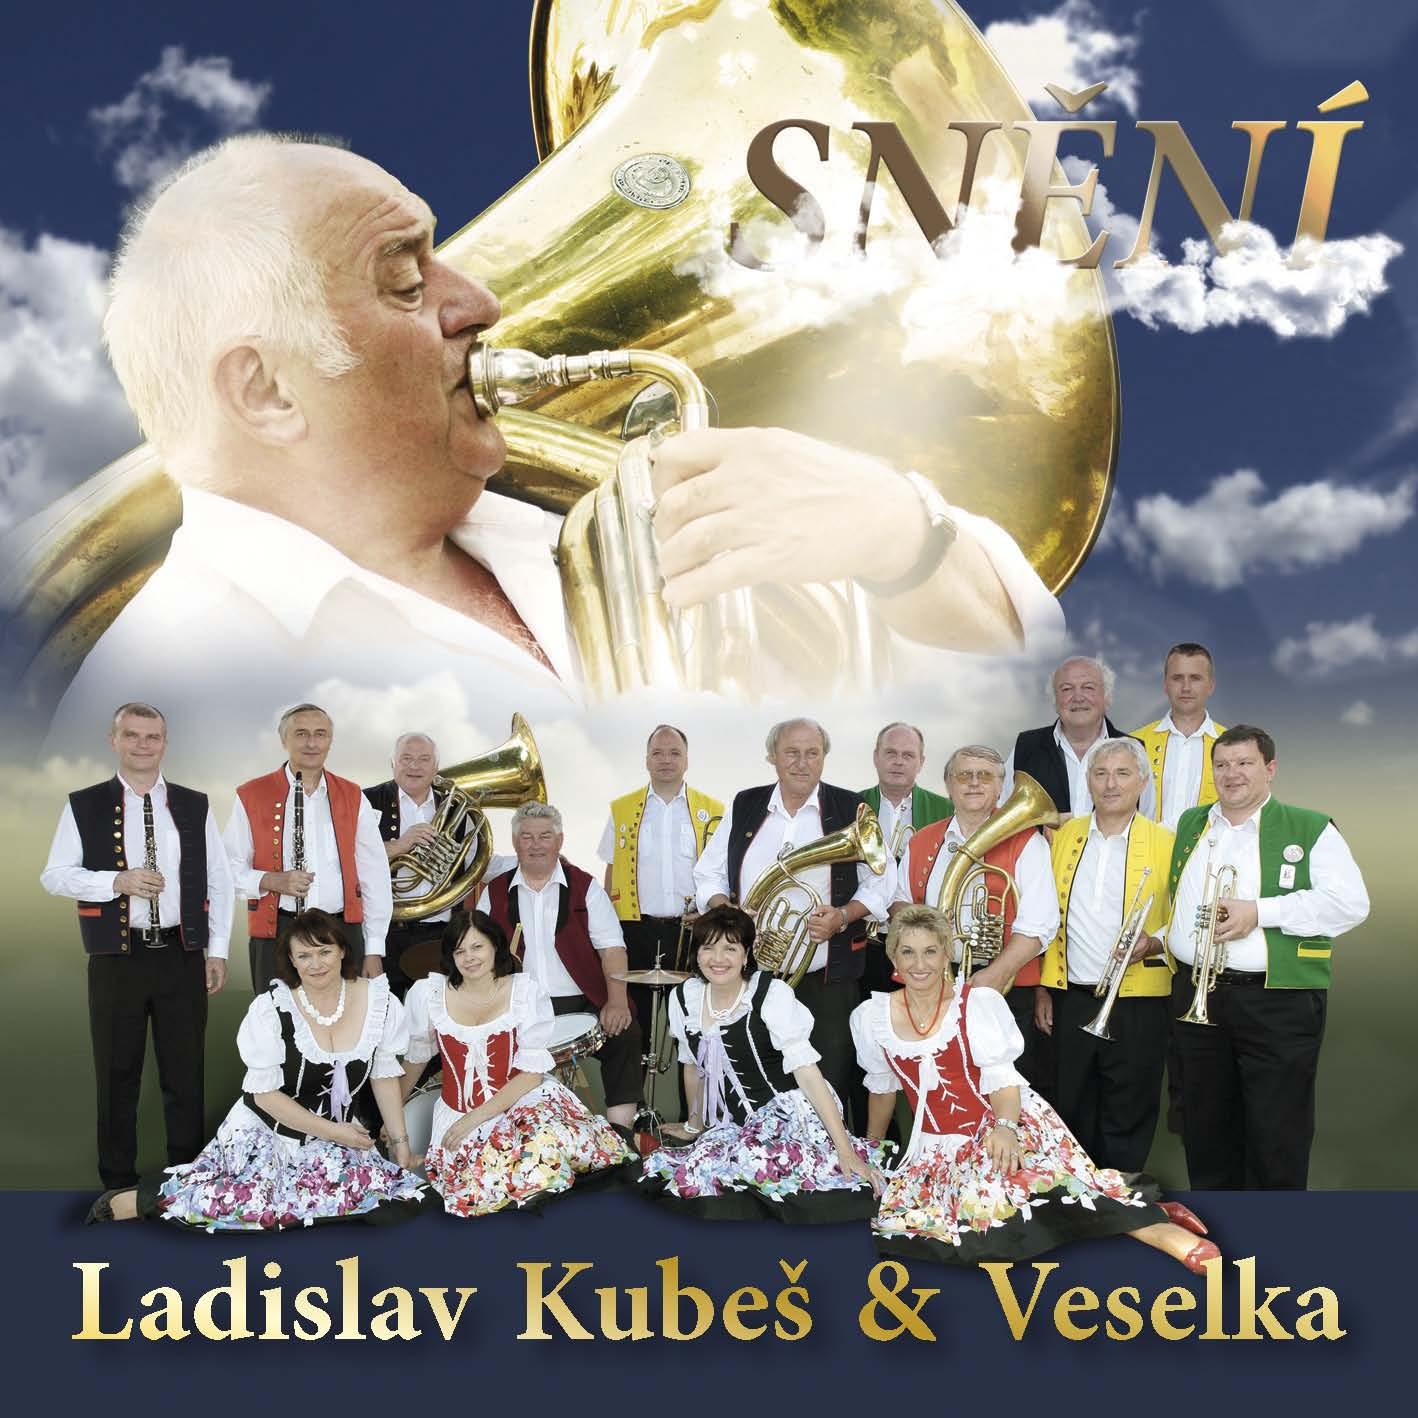 Veselka-CD_ansicht_blau-gold_Stránka_1